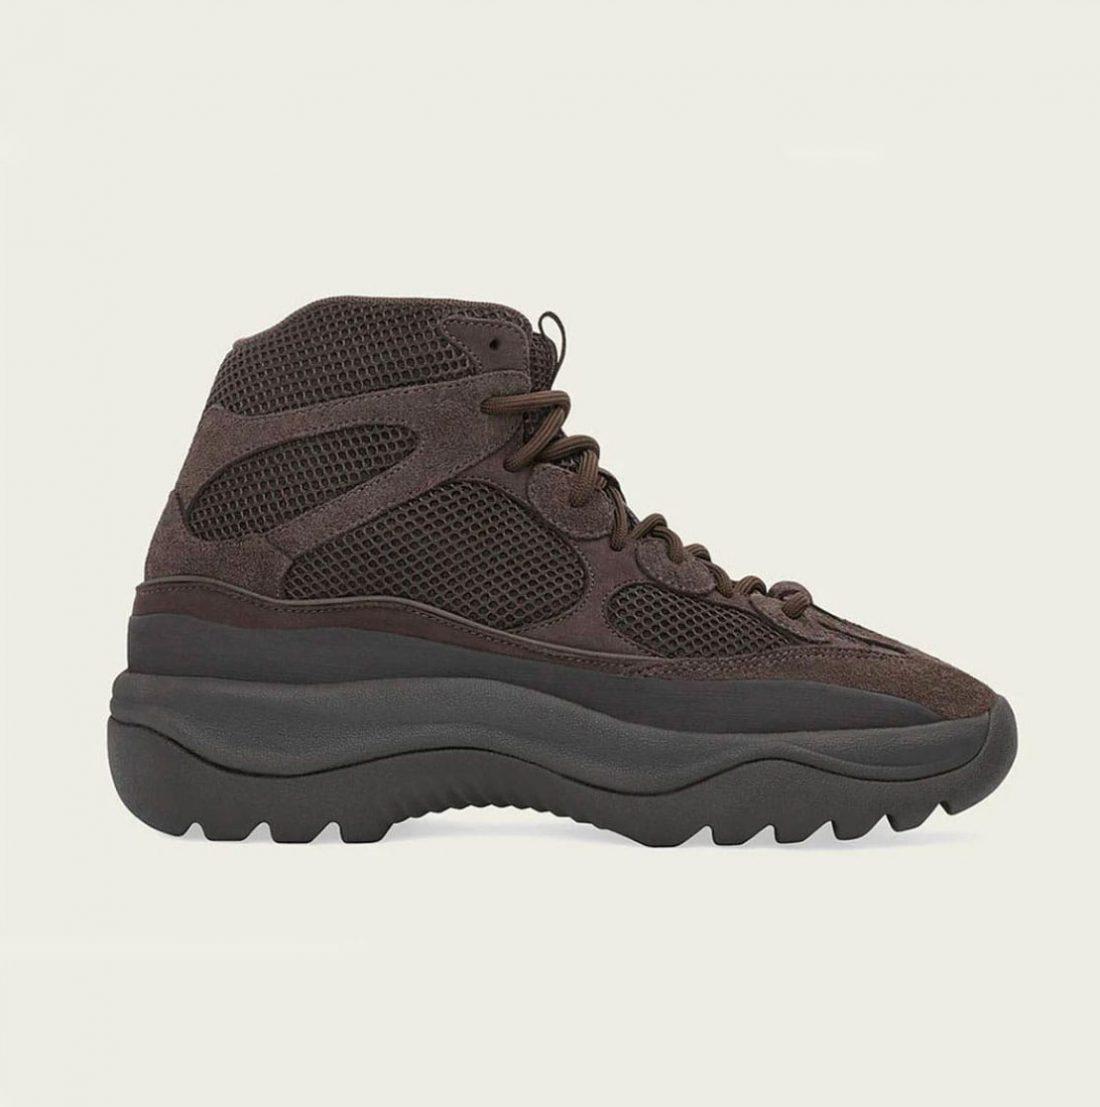 adidas Yeezy Desert Boot «Oil»